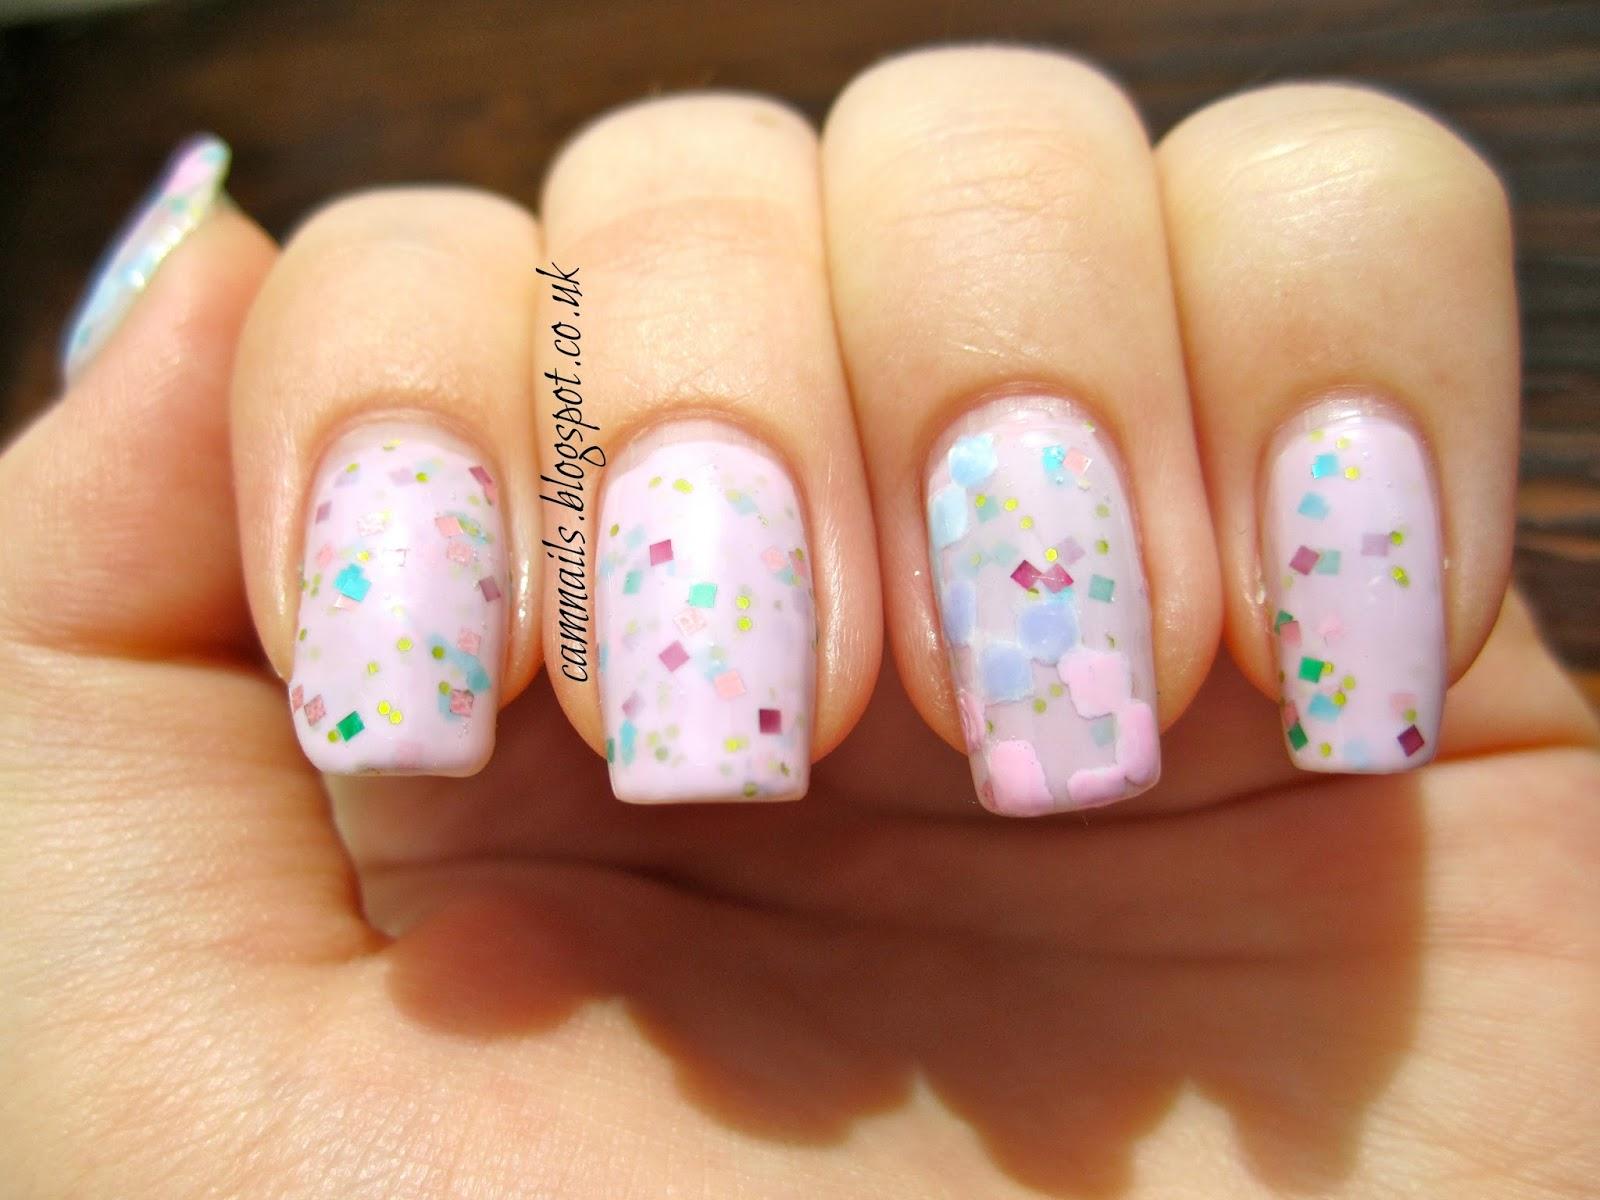 Cambridge Nails Pastel Pixellation Nail Art